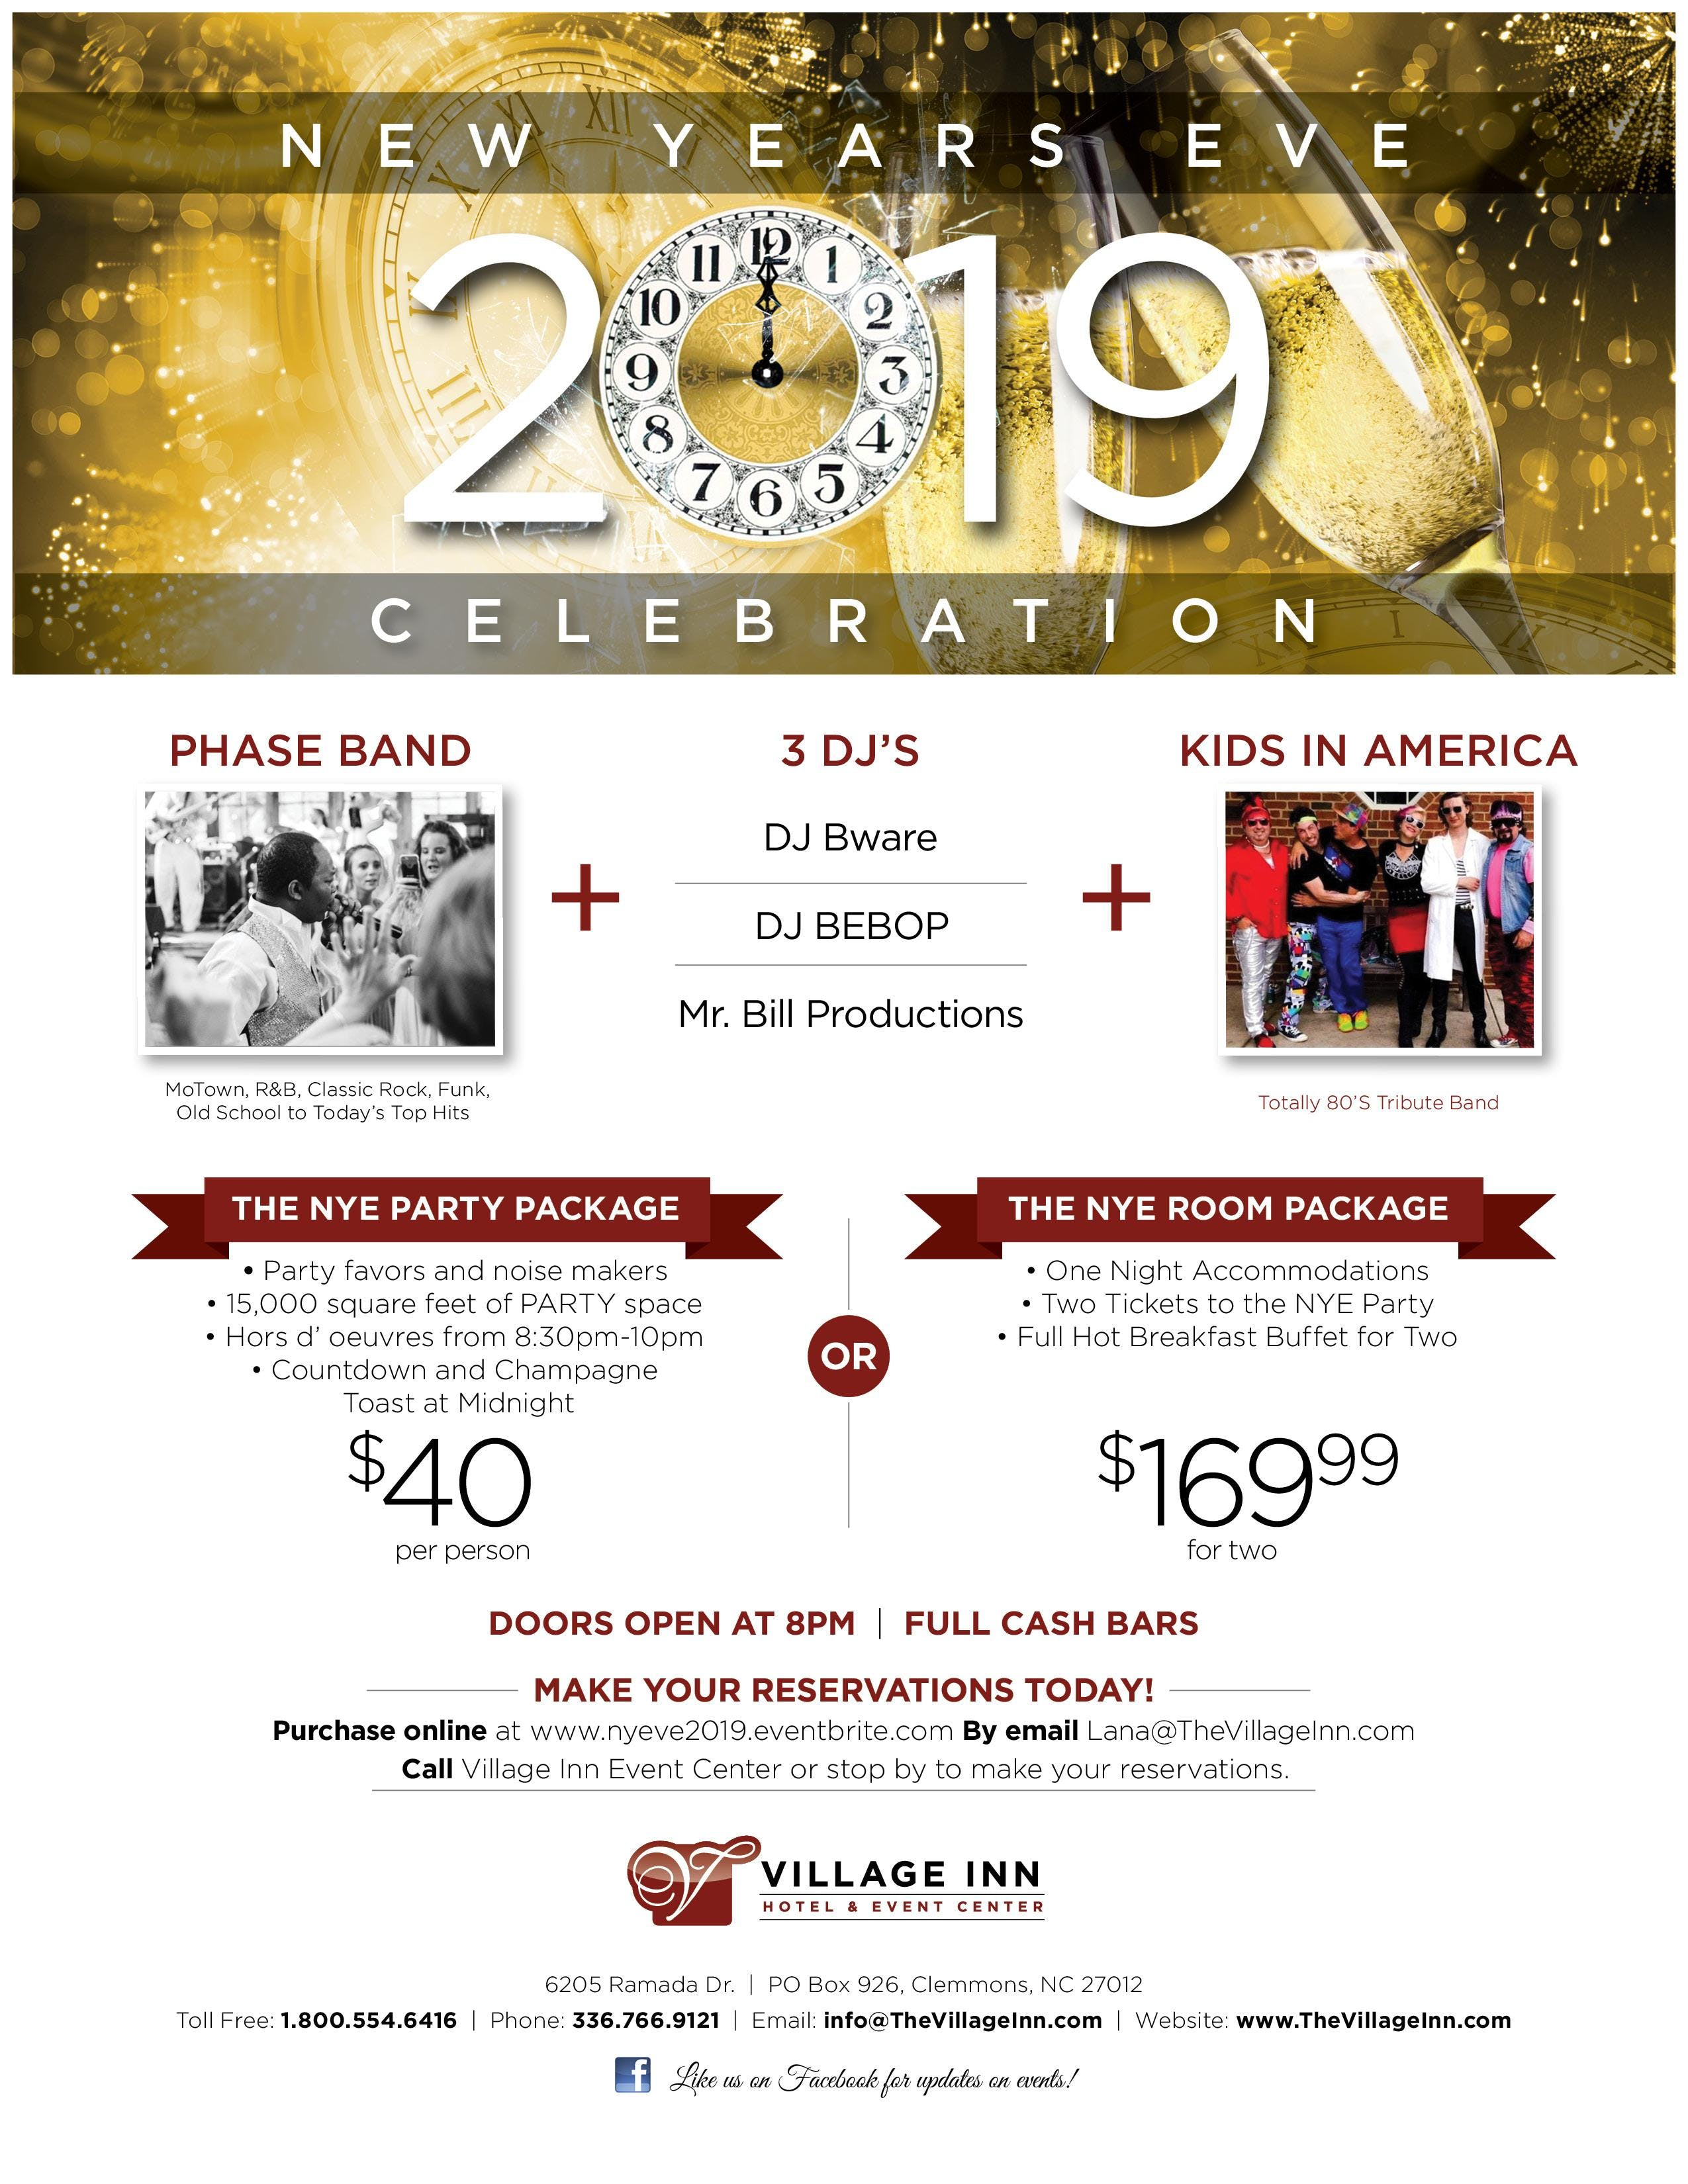 New Year's Eve 2019 Celebration!, Greensboro NC - Dec 31, 2018 - 8:00 PM